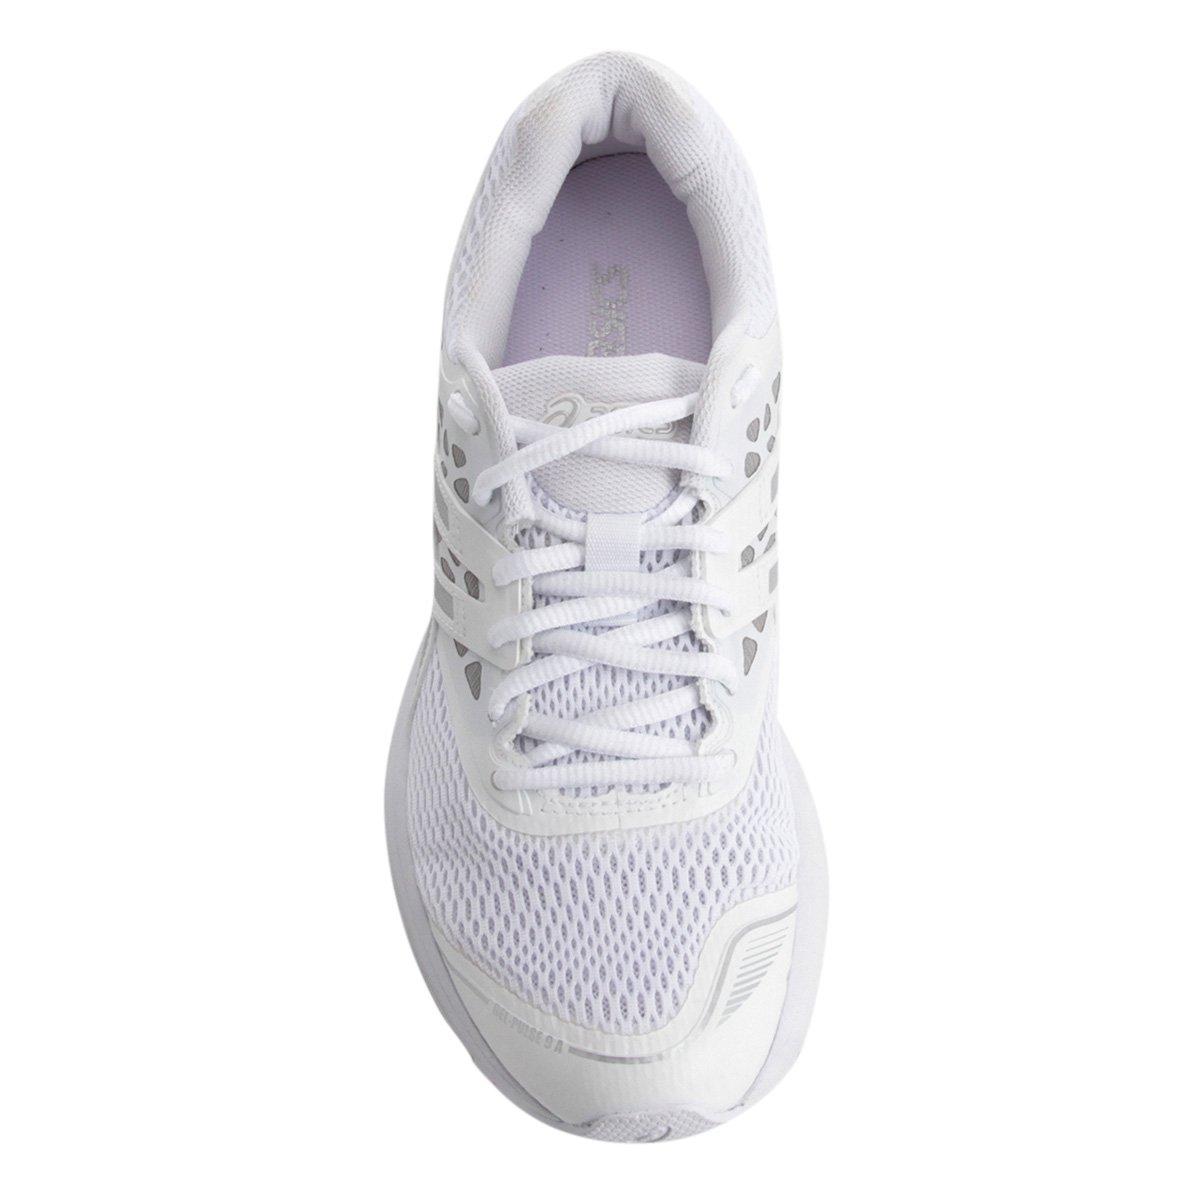 Branco prata A 9 e Tênis Pulse Gel Asics Feminino qzYU47f